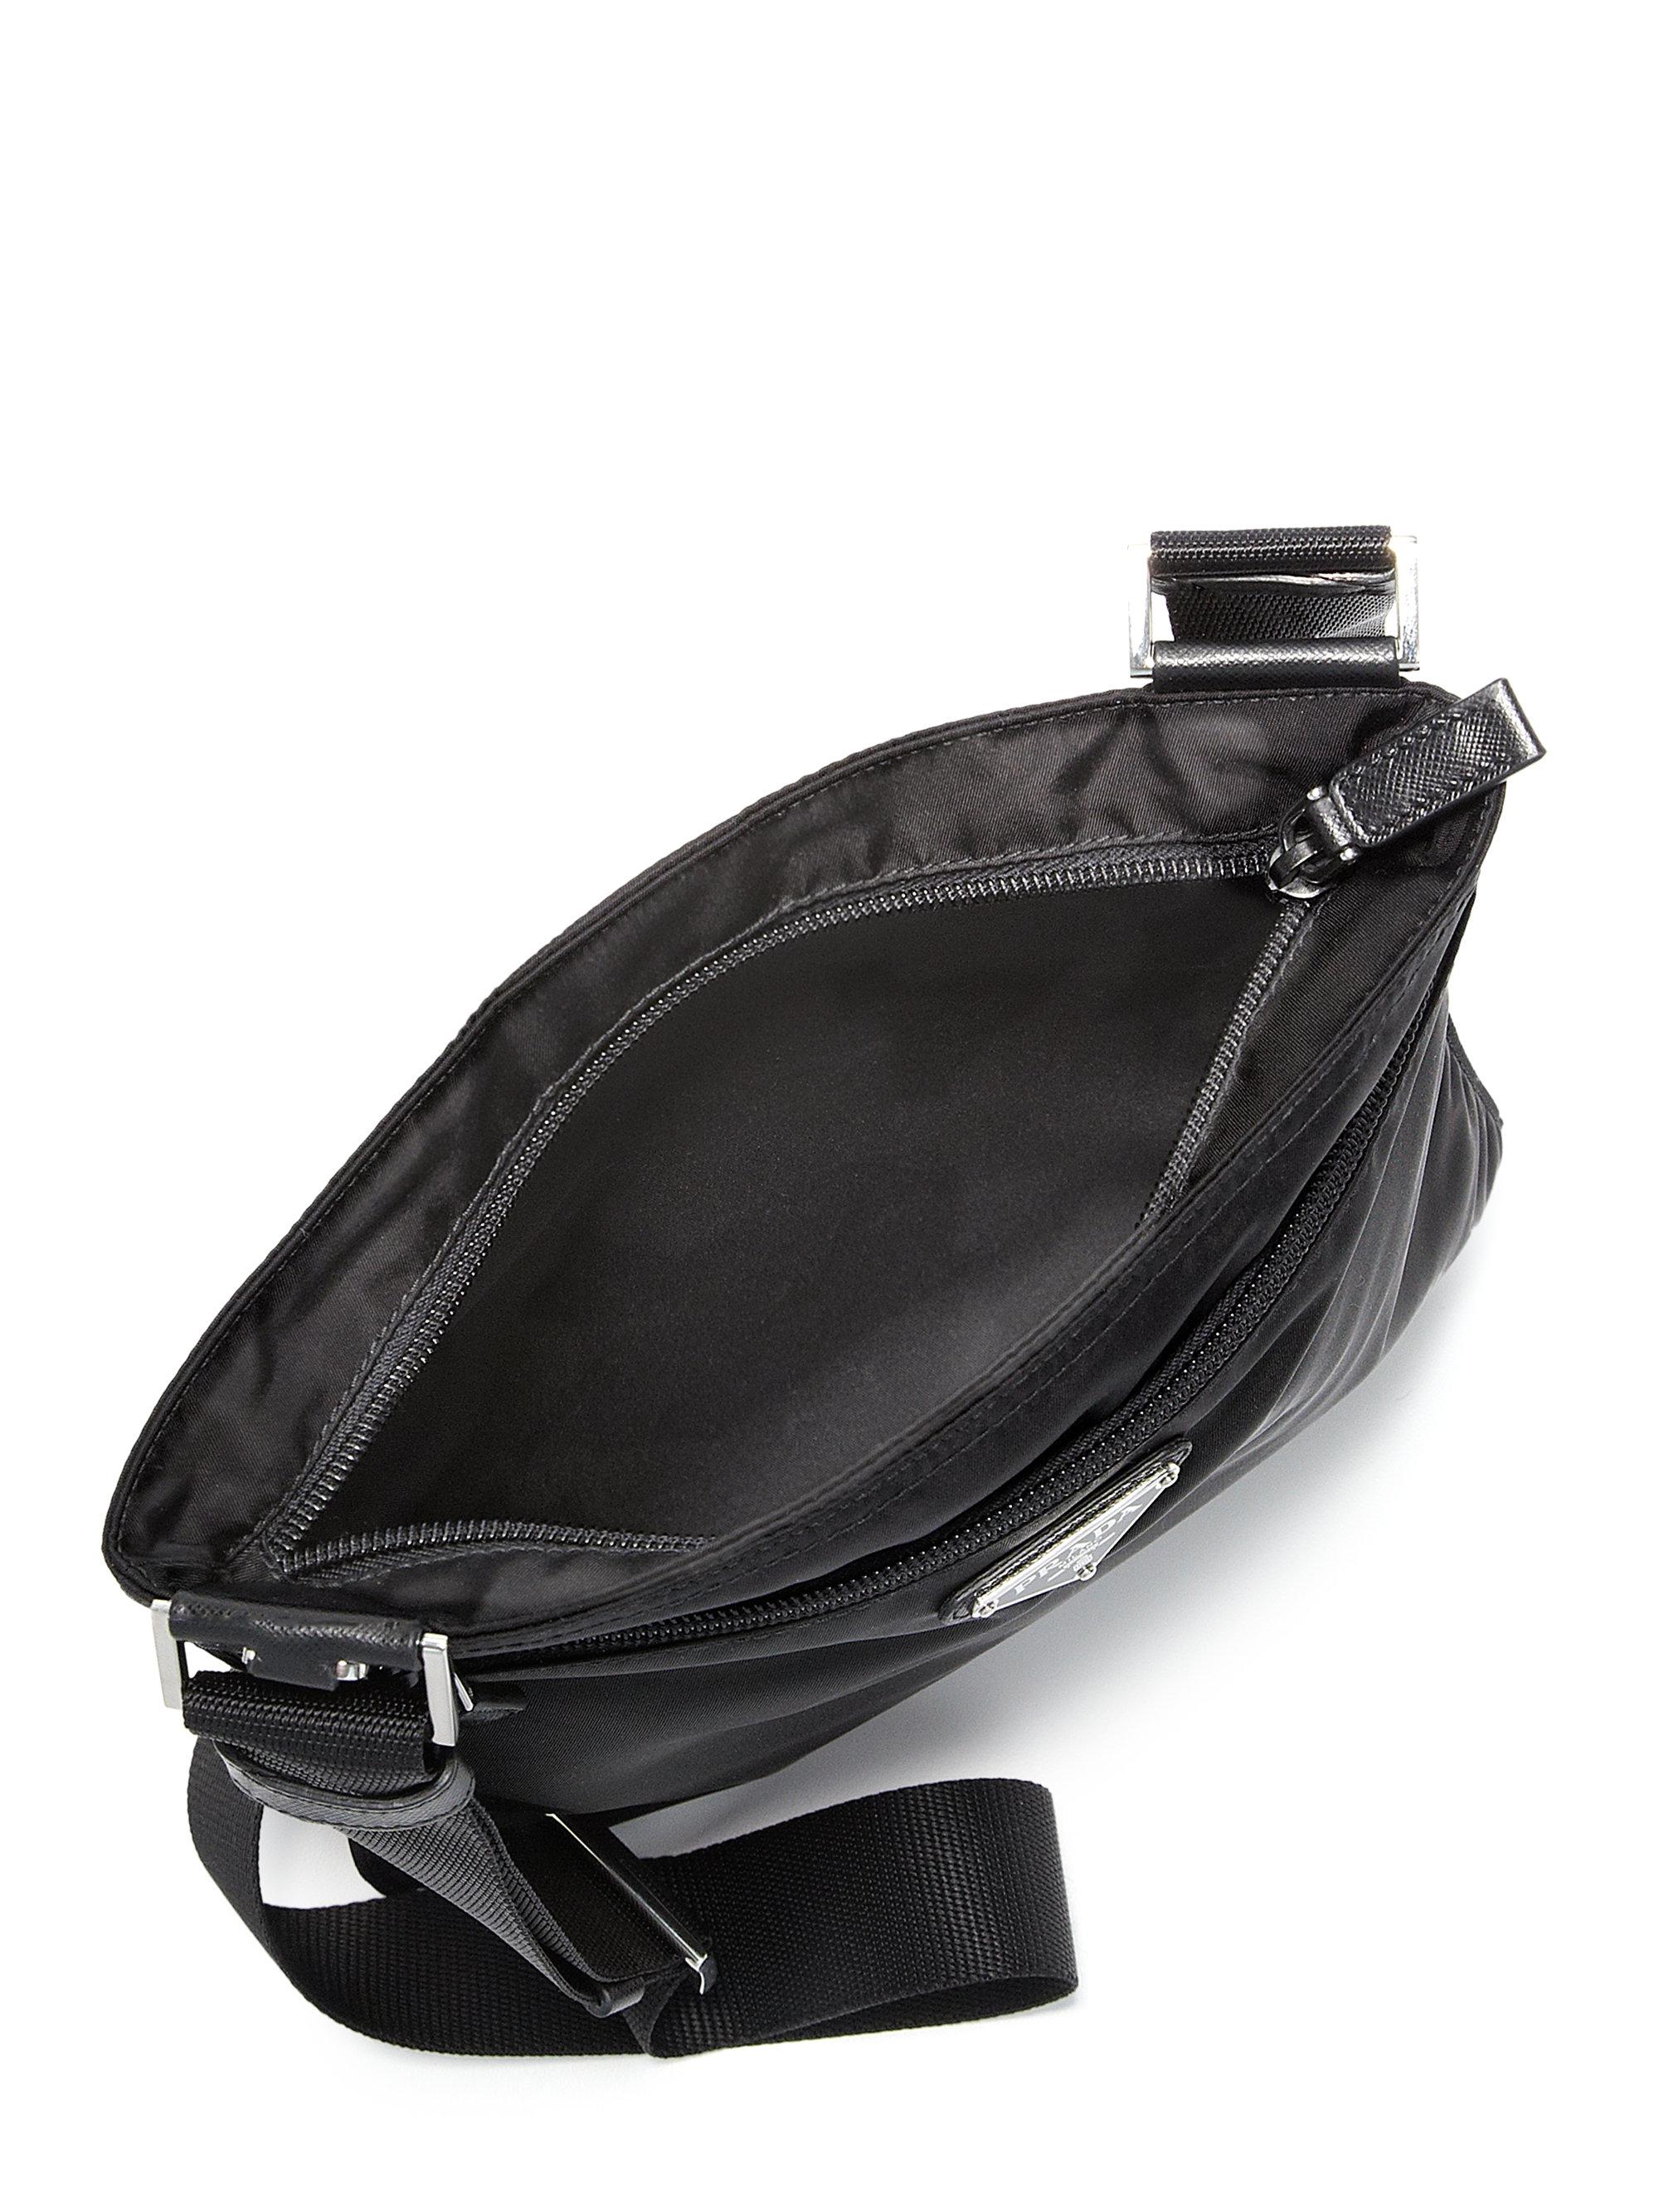 cheap prada bag - Prada Medium Soft Calf Inside Bag in Black | Lyst